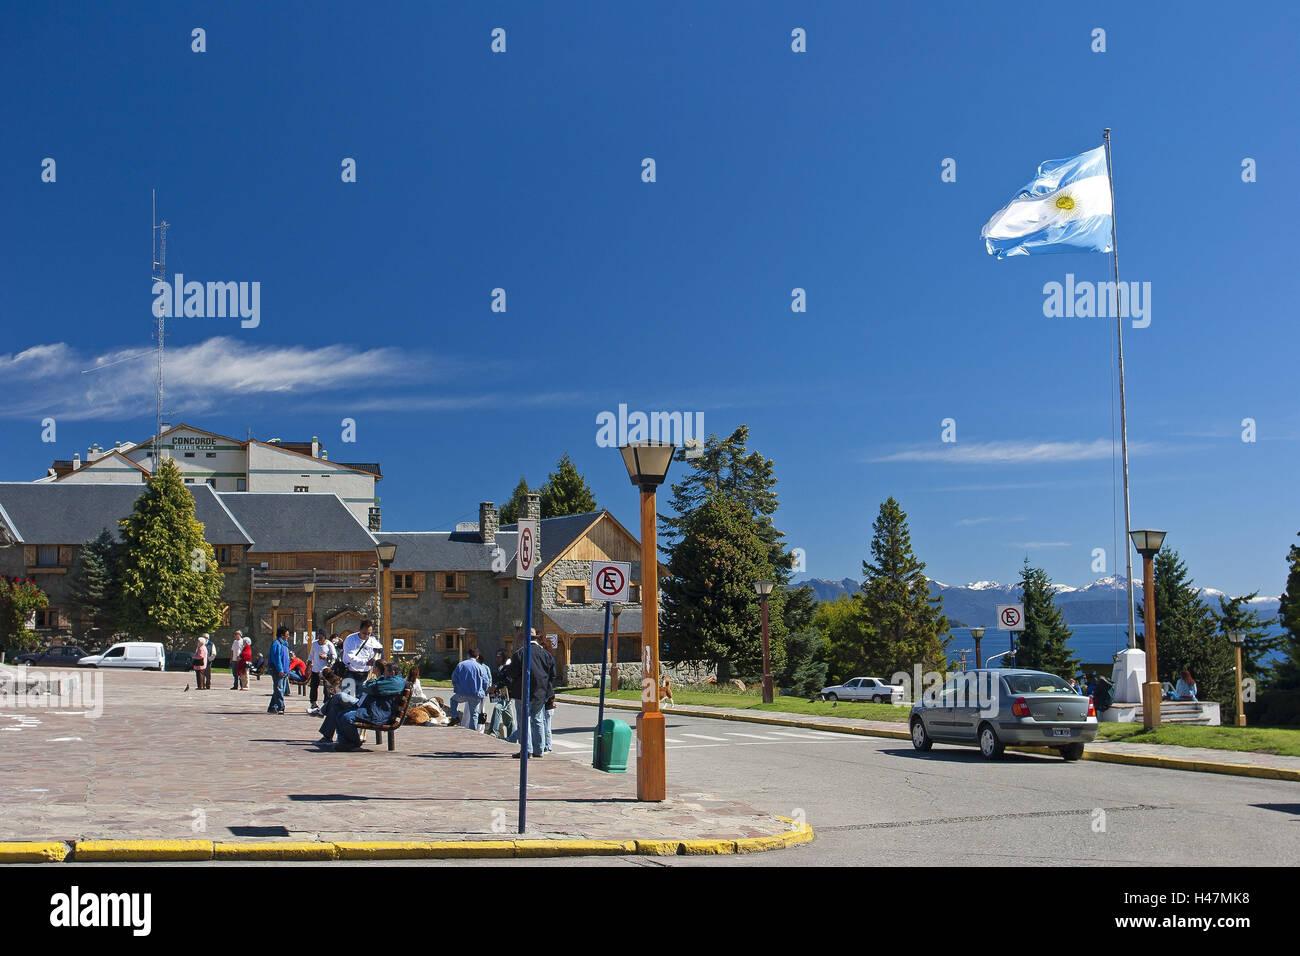 Argentina, Patagonia, Bariloche, space Centro Civico in the lake Lago Nahuel Huapi, tourists, - Stock Image